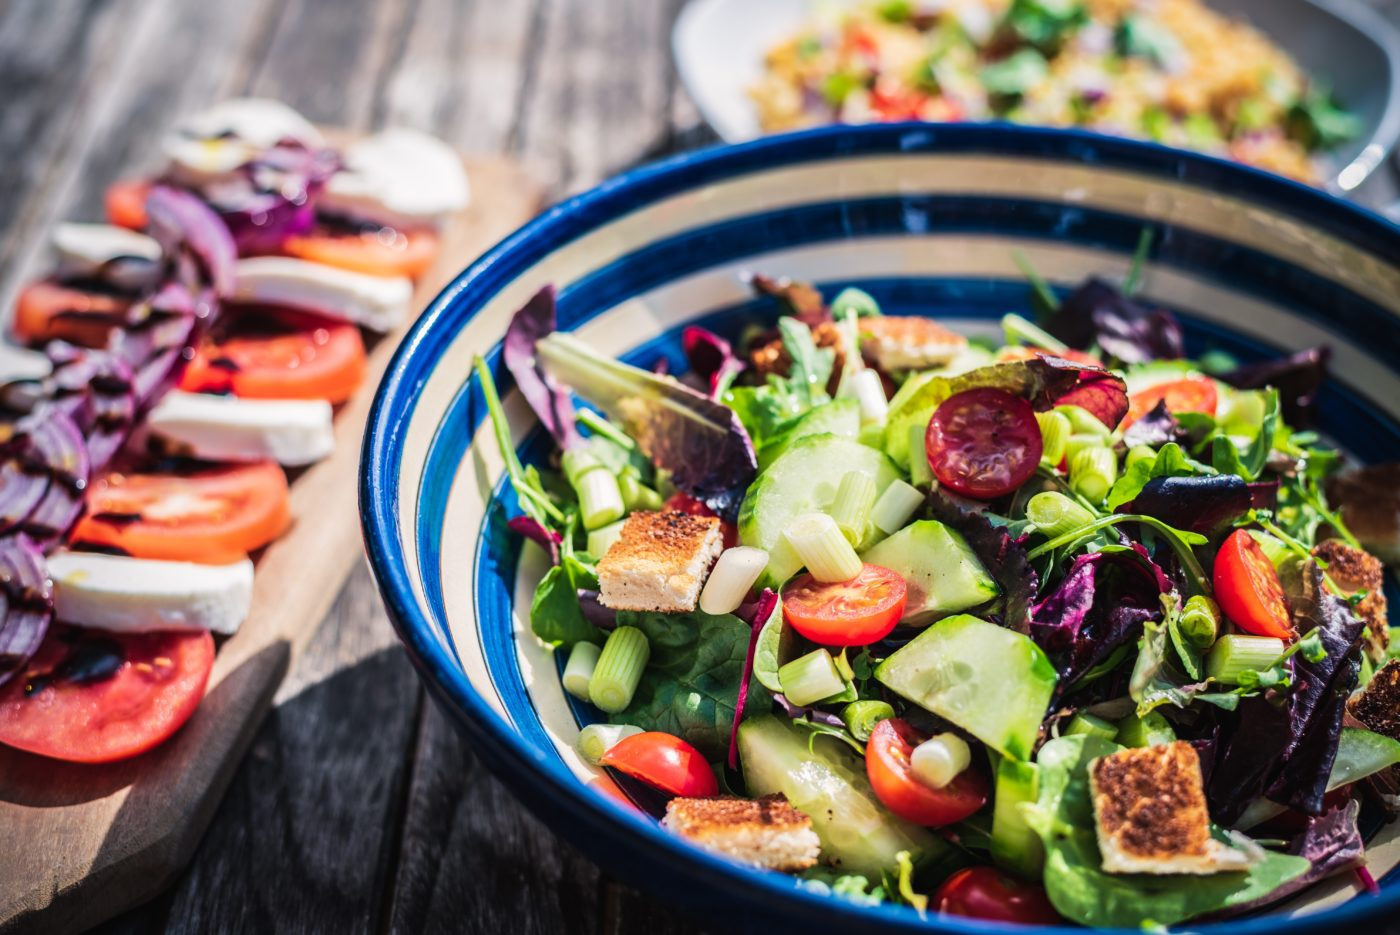 6 Basic Rules for Good Health